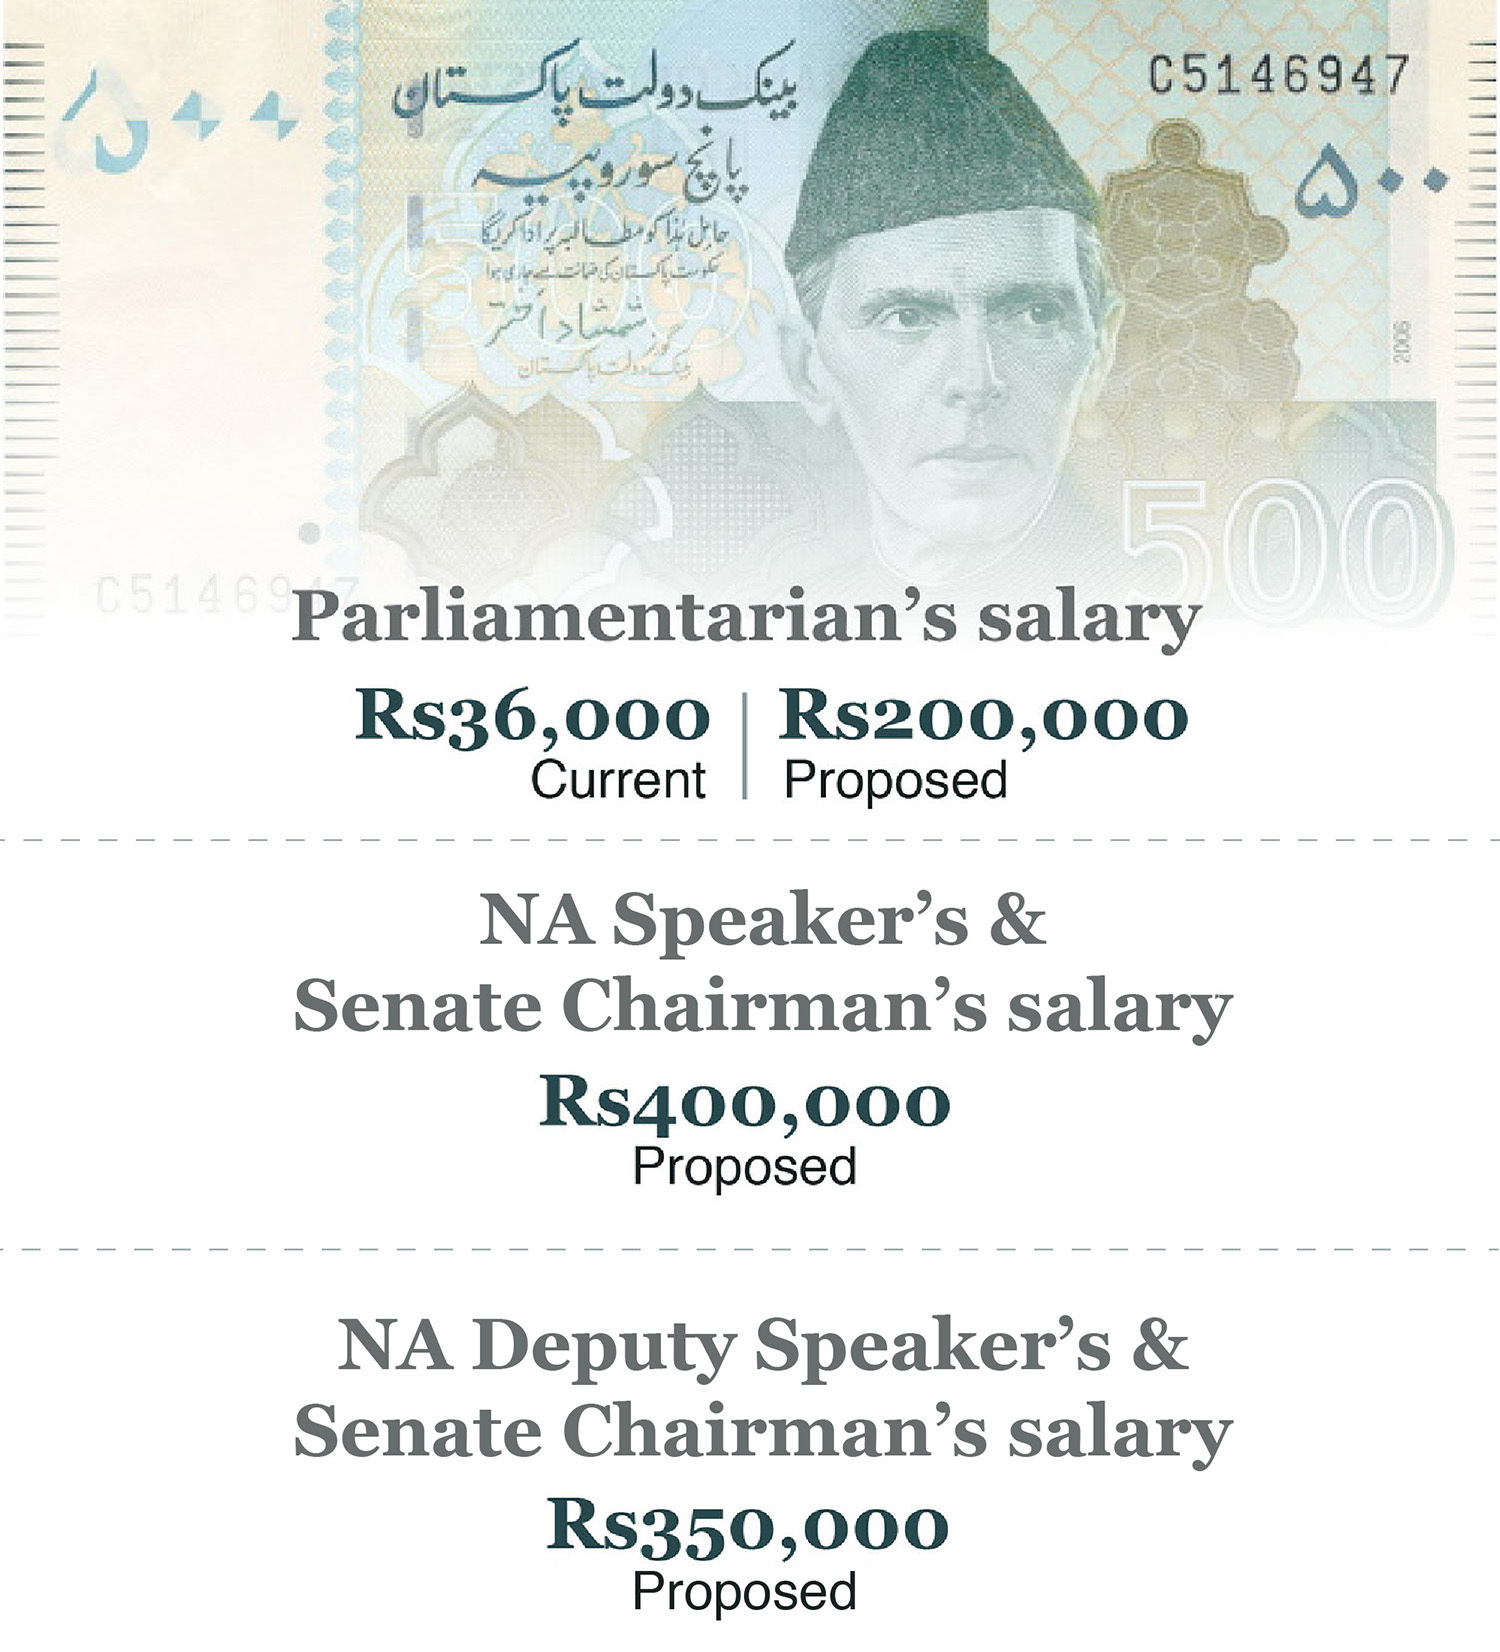 Illustration by Fahad Naveed/Dawn.com